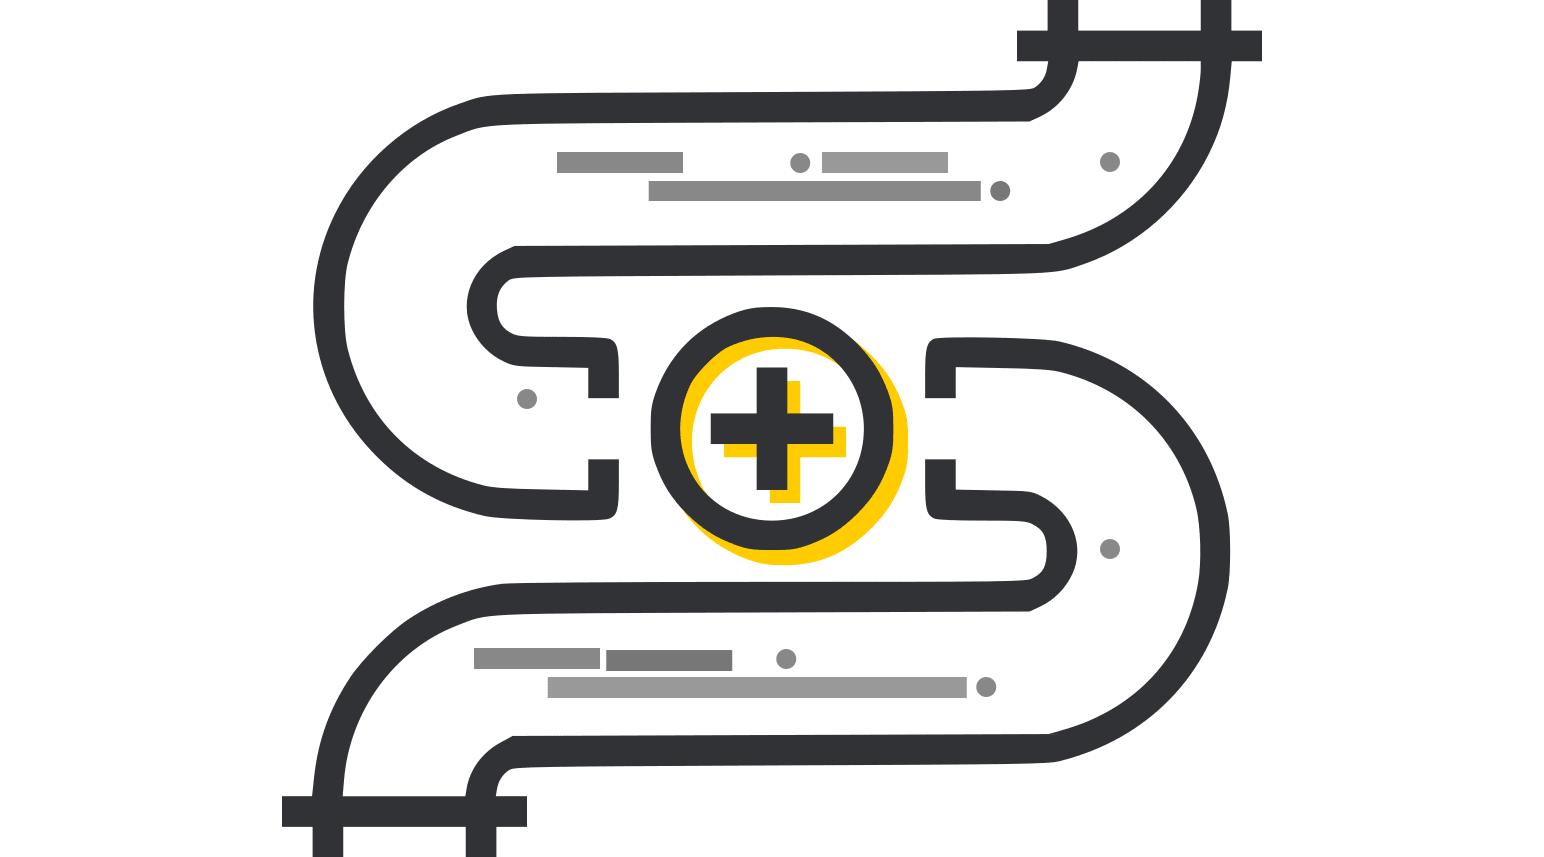 Data Pipeline Tools image